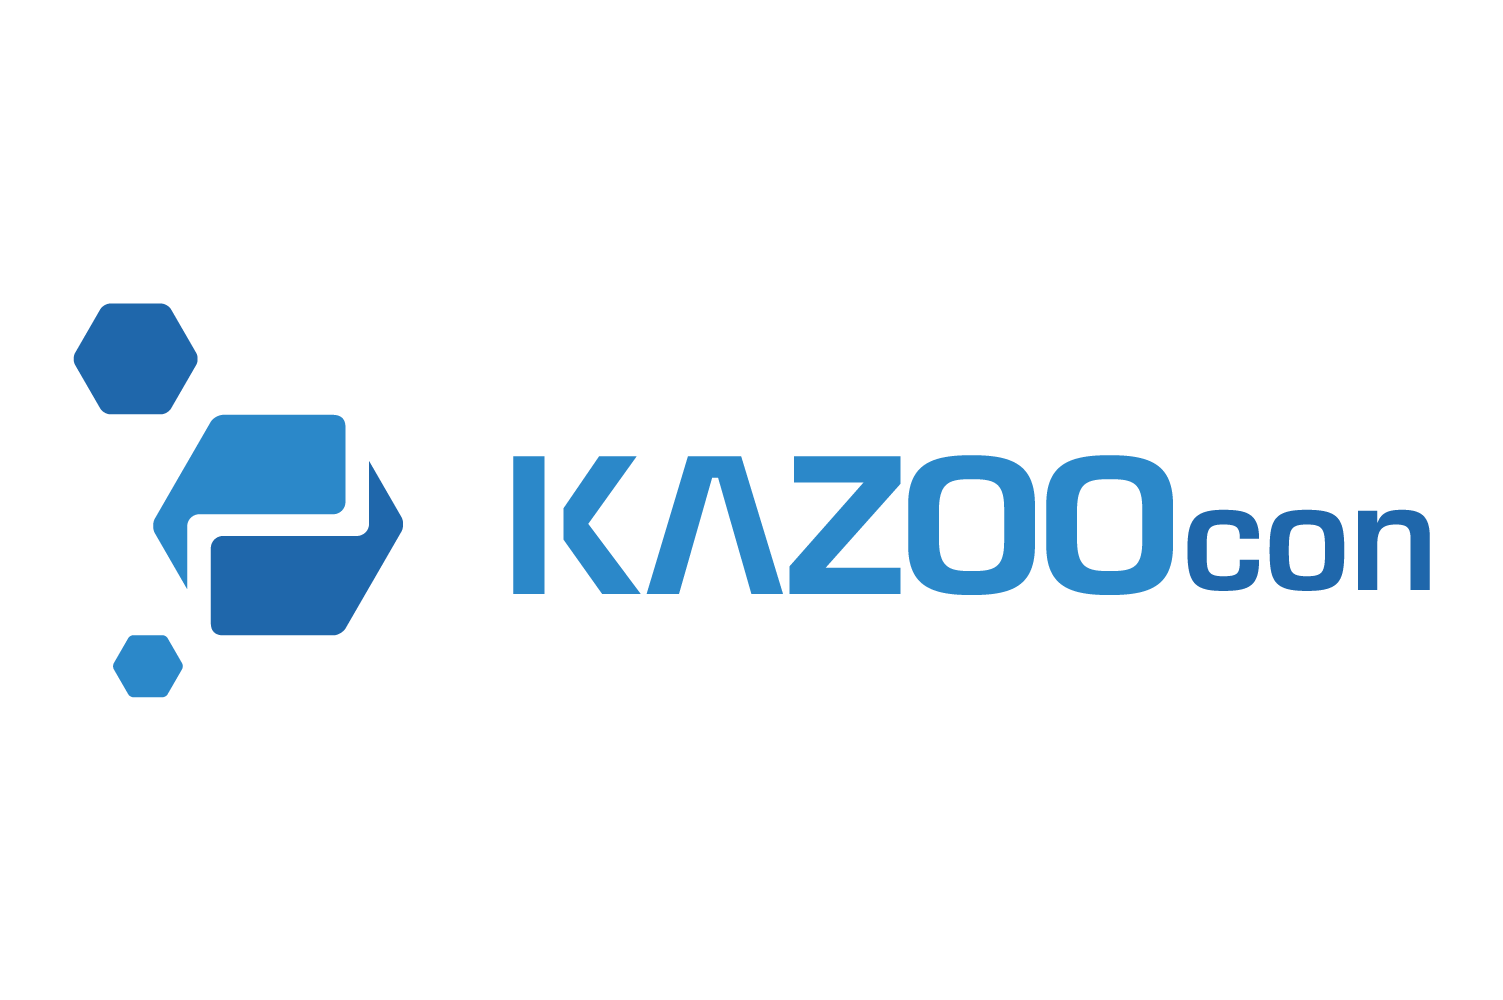 KAZOO-hubspot.png